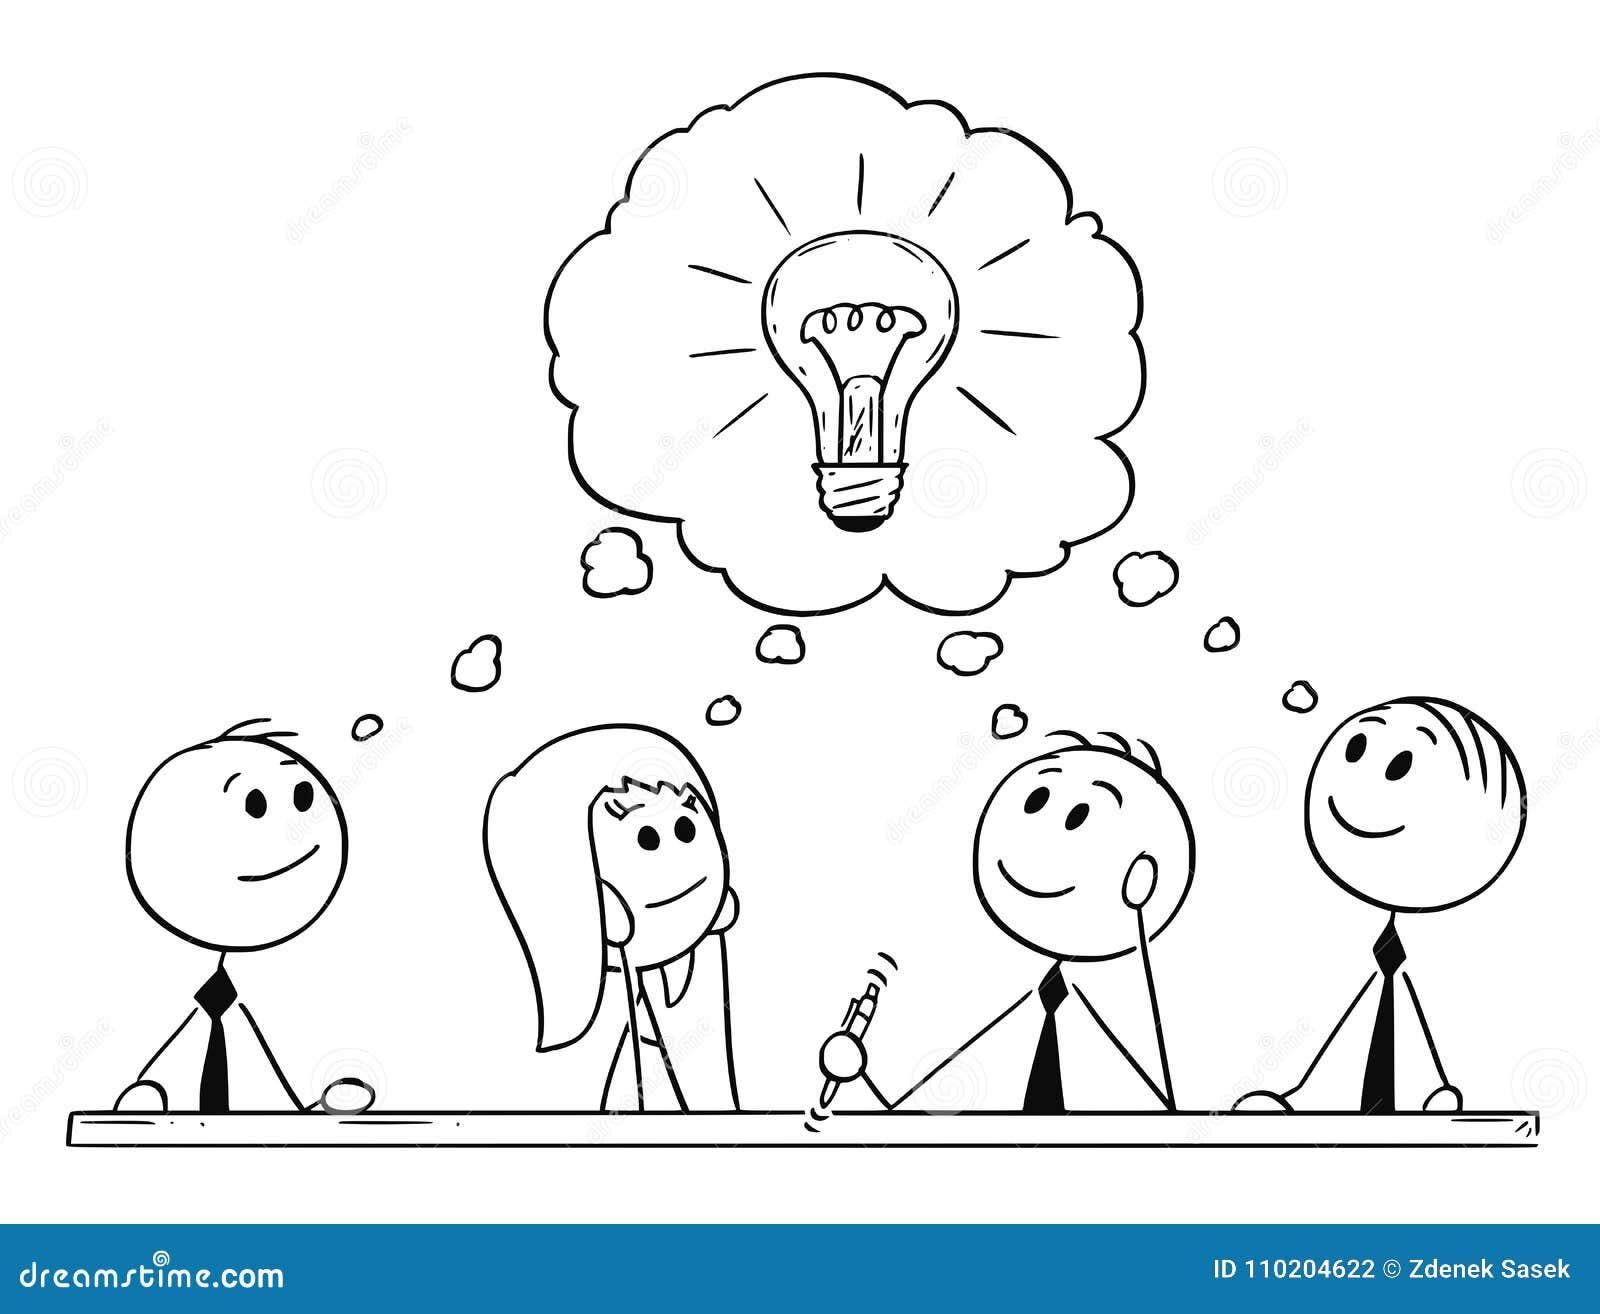 Kreskówka biznes drużyny Brainstorming i spotkanie